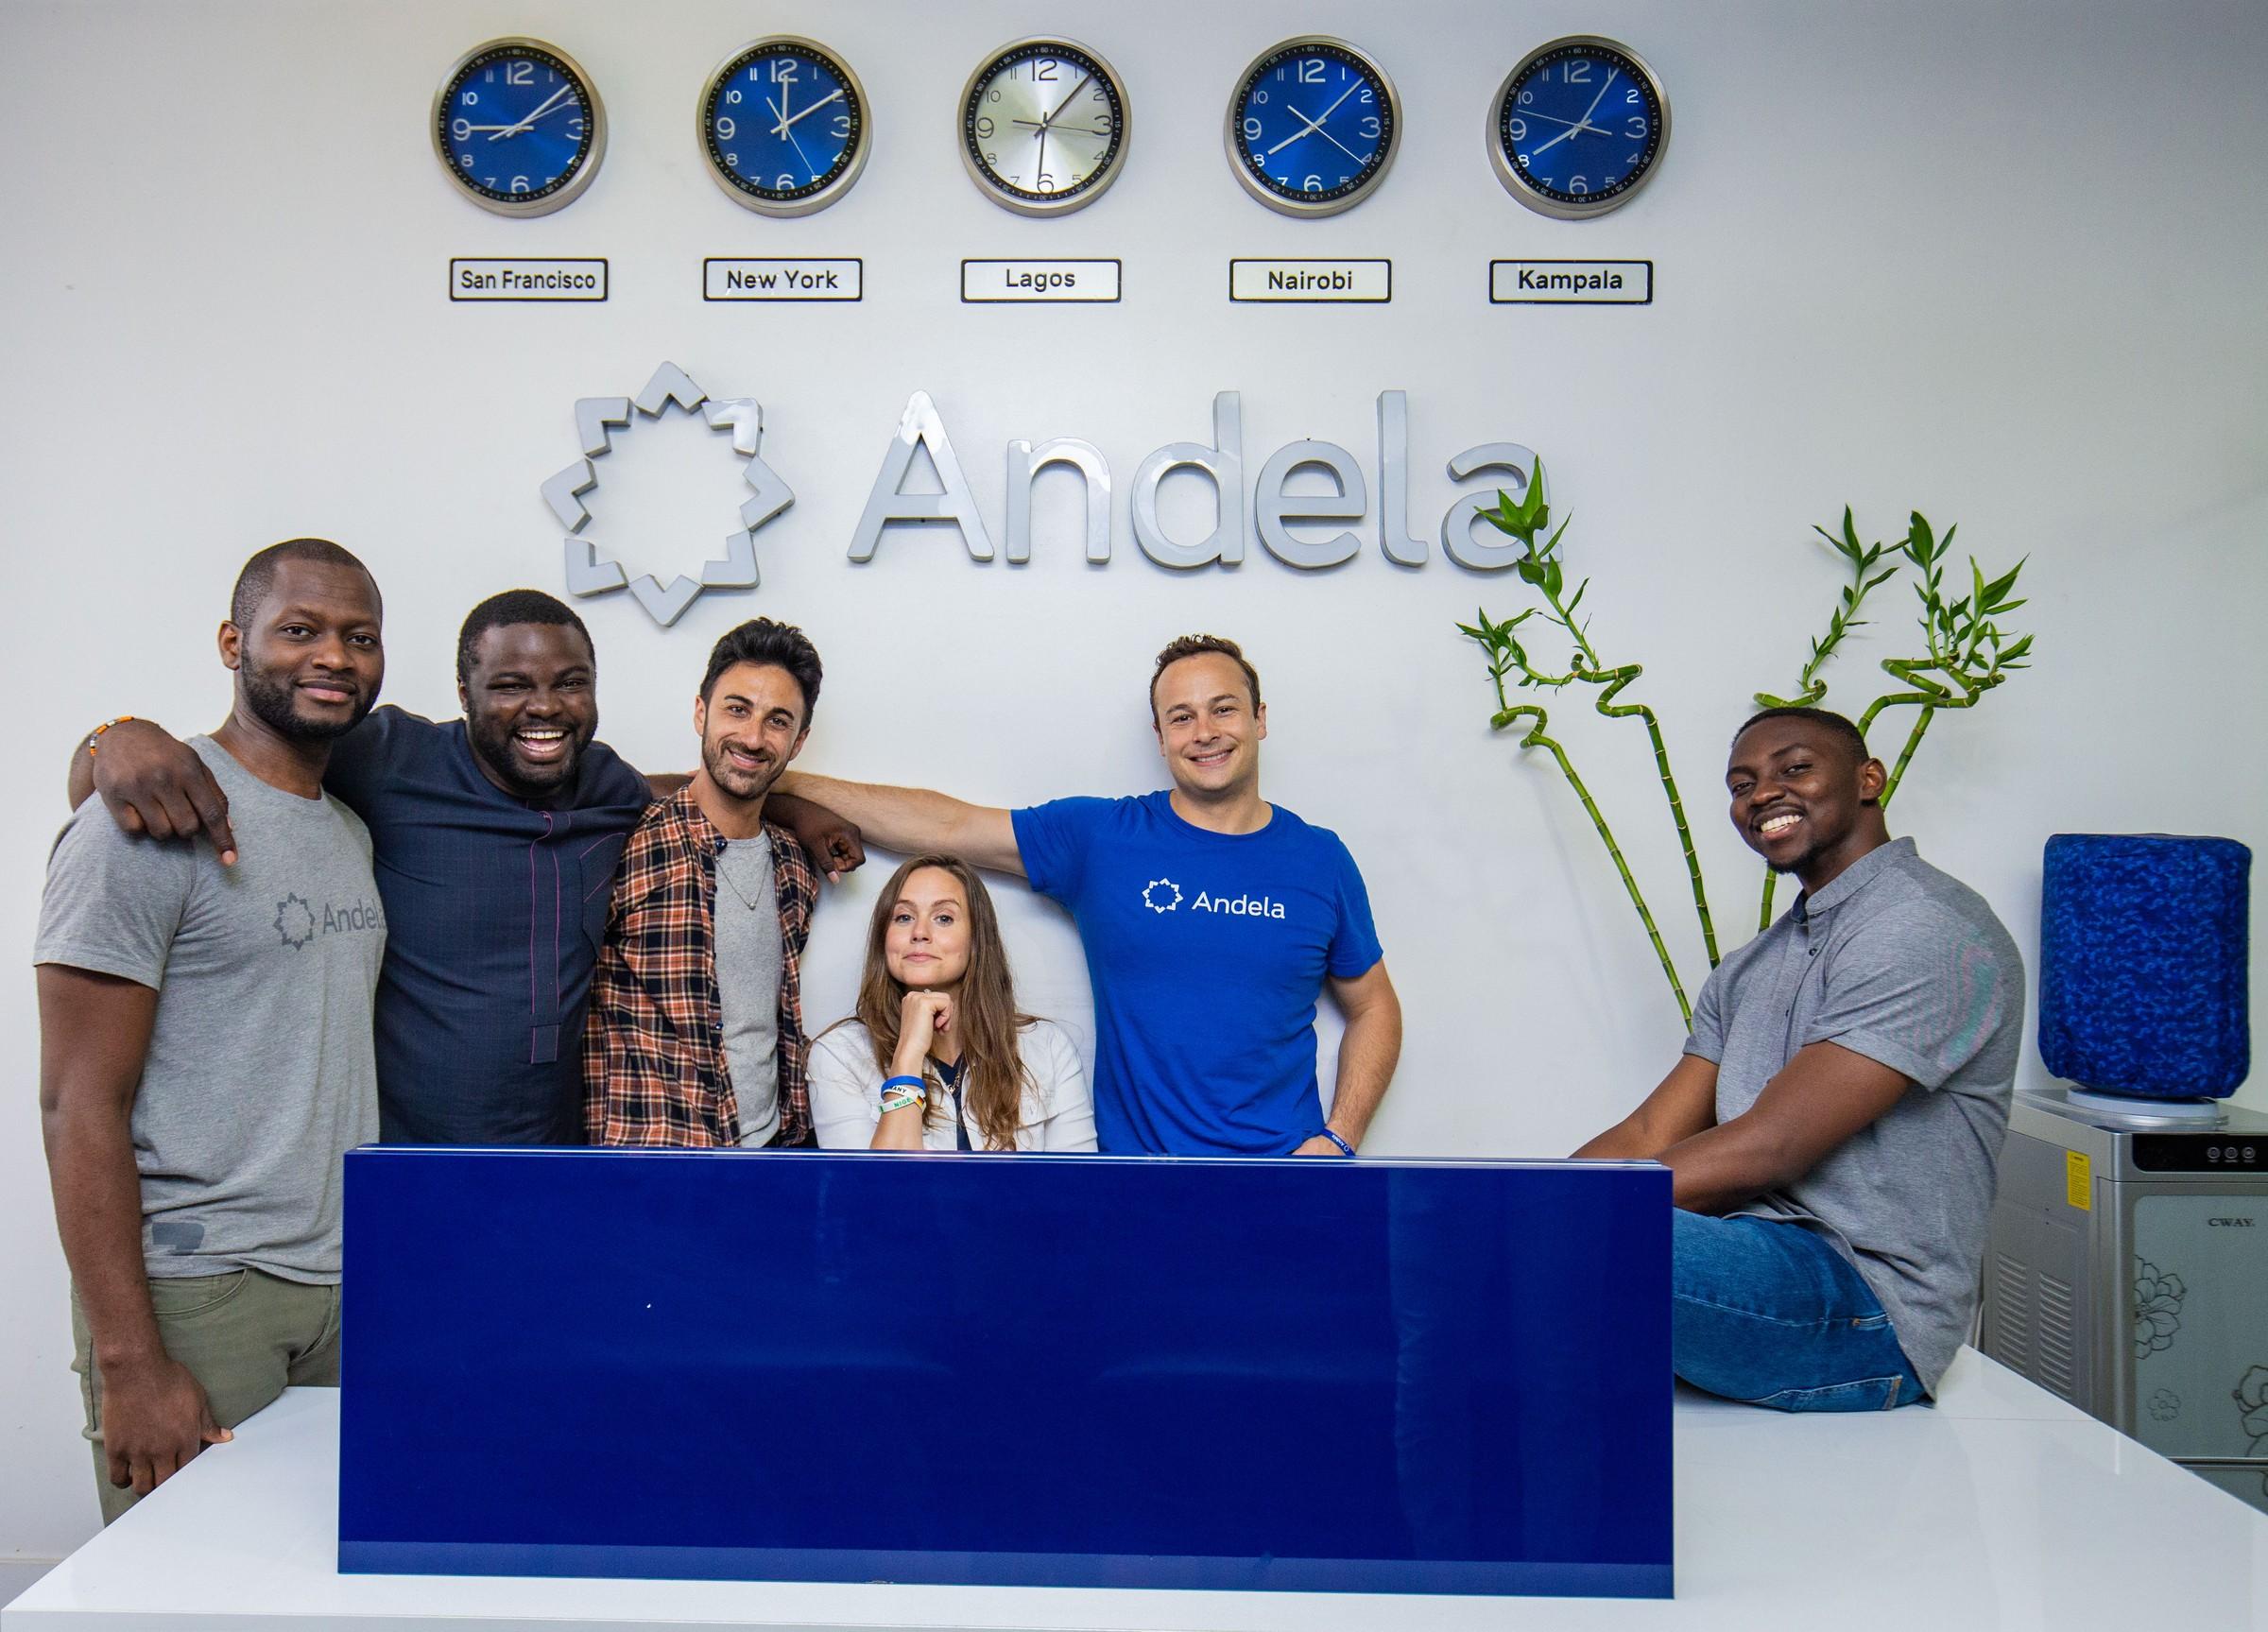 Les six fondateurs d'Andela (de gauche à droite): Brice Nkengsa, Iyinoluwa Aboyeji, Ian Carnevale, Christina Sass, Jeremy Johnson, Nadayar Enegesi.